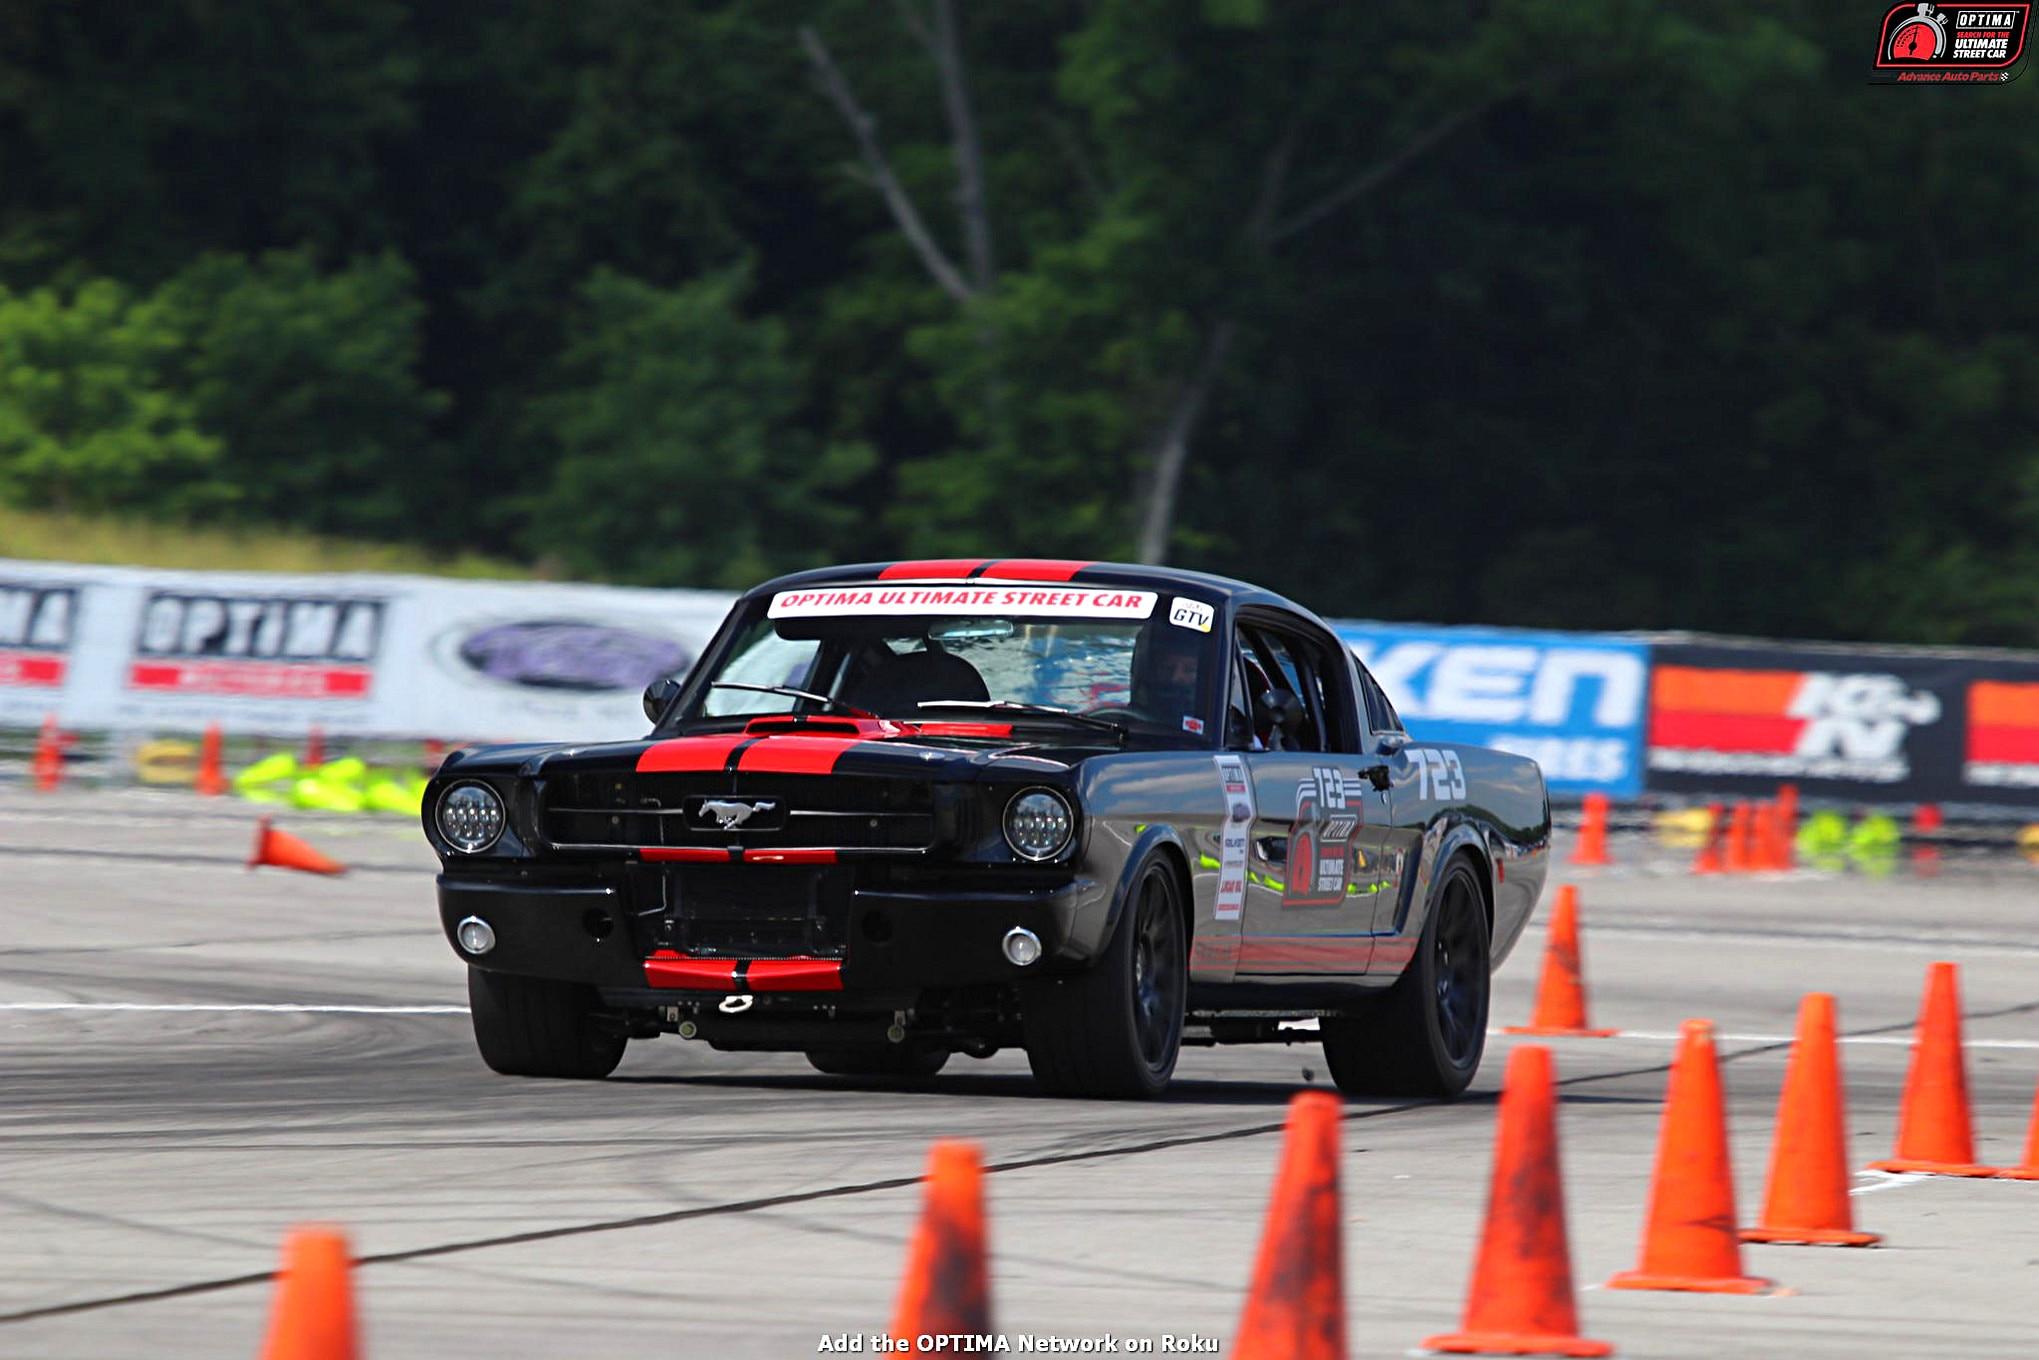 MMFF Robert Britton 1965 Ford Mustang DriveOPTIMA NCM Motorsports Park 2017 56 012